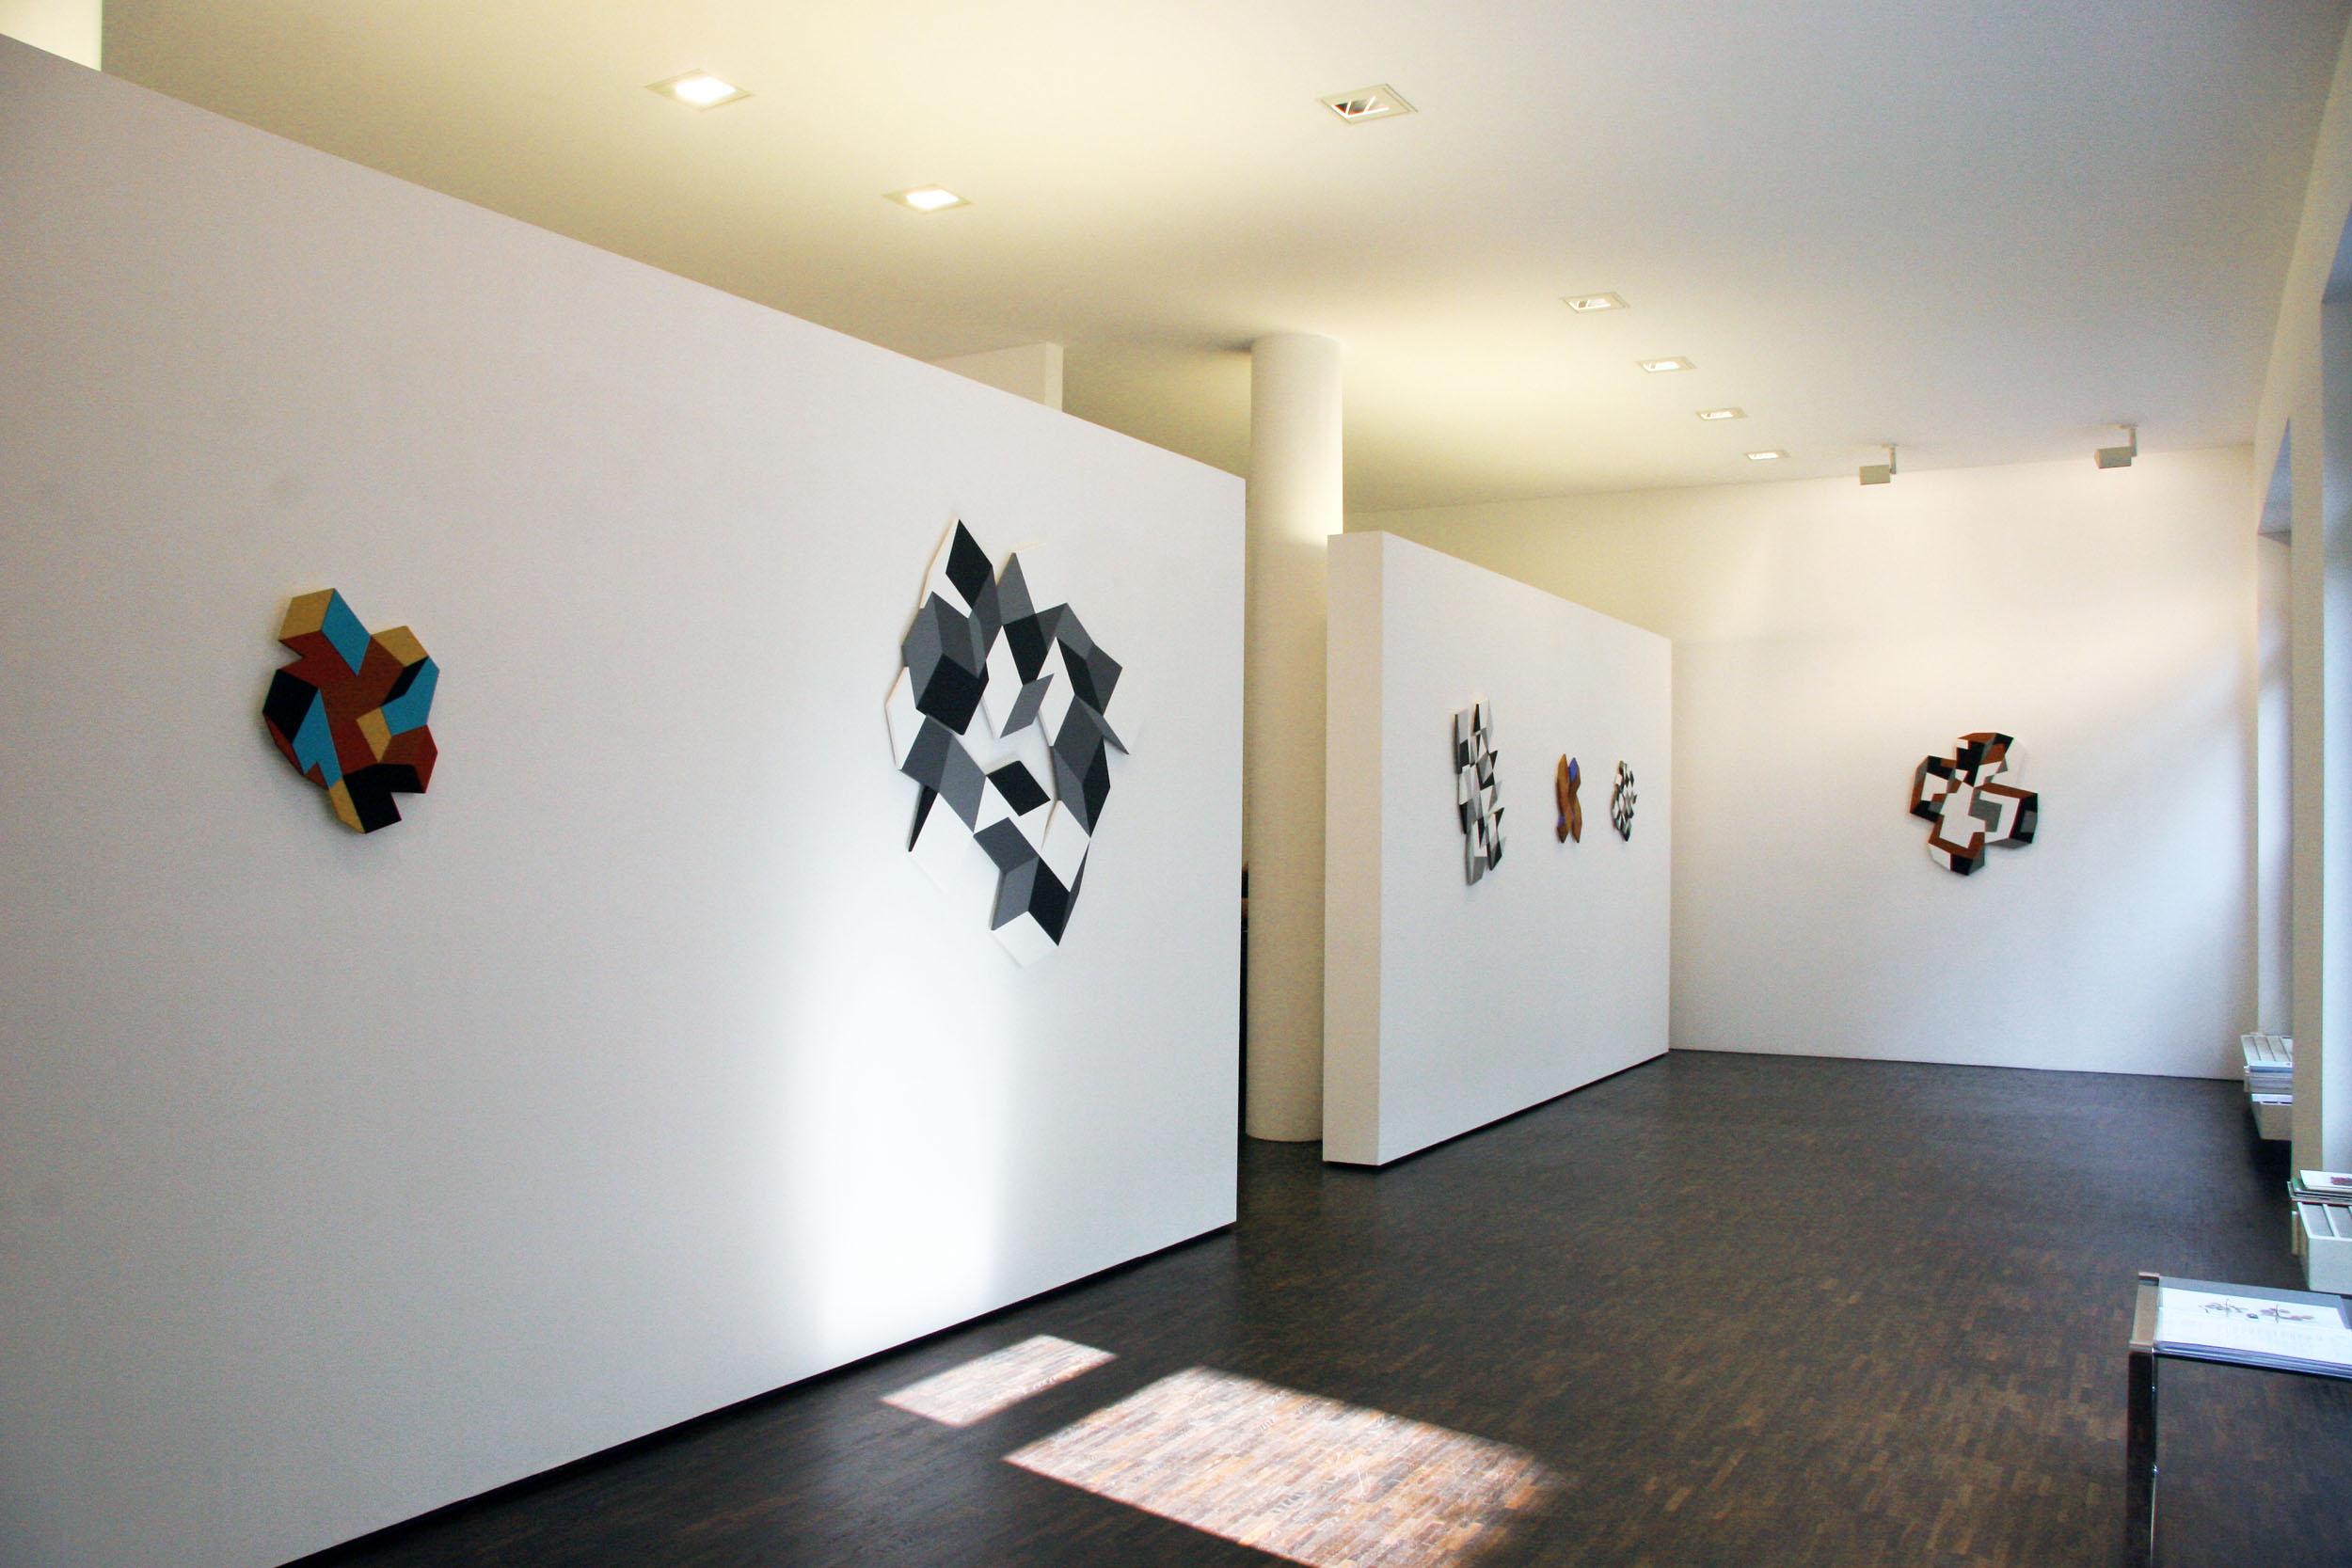 2007 Galerie Klaus Braun Text and Image 4.jpg